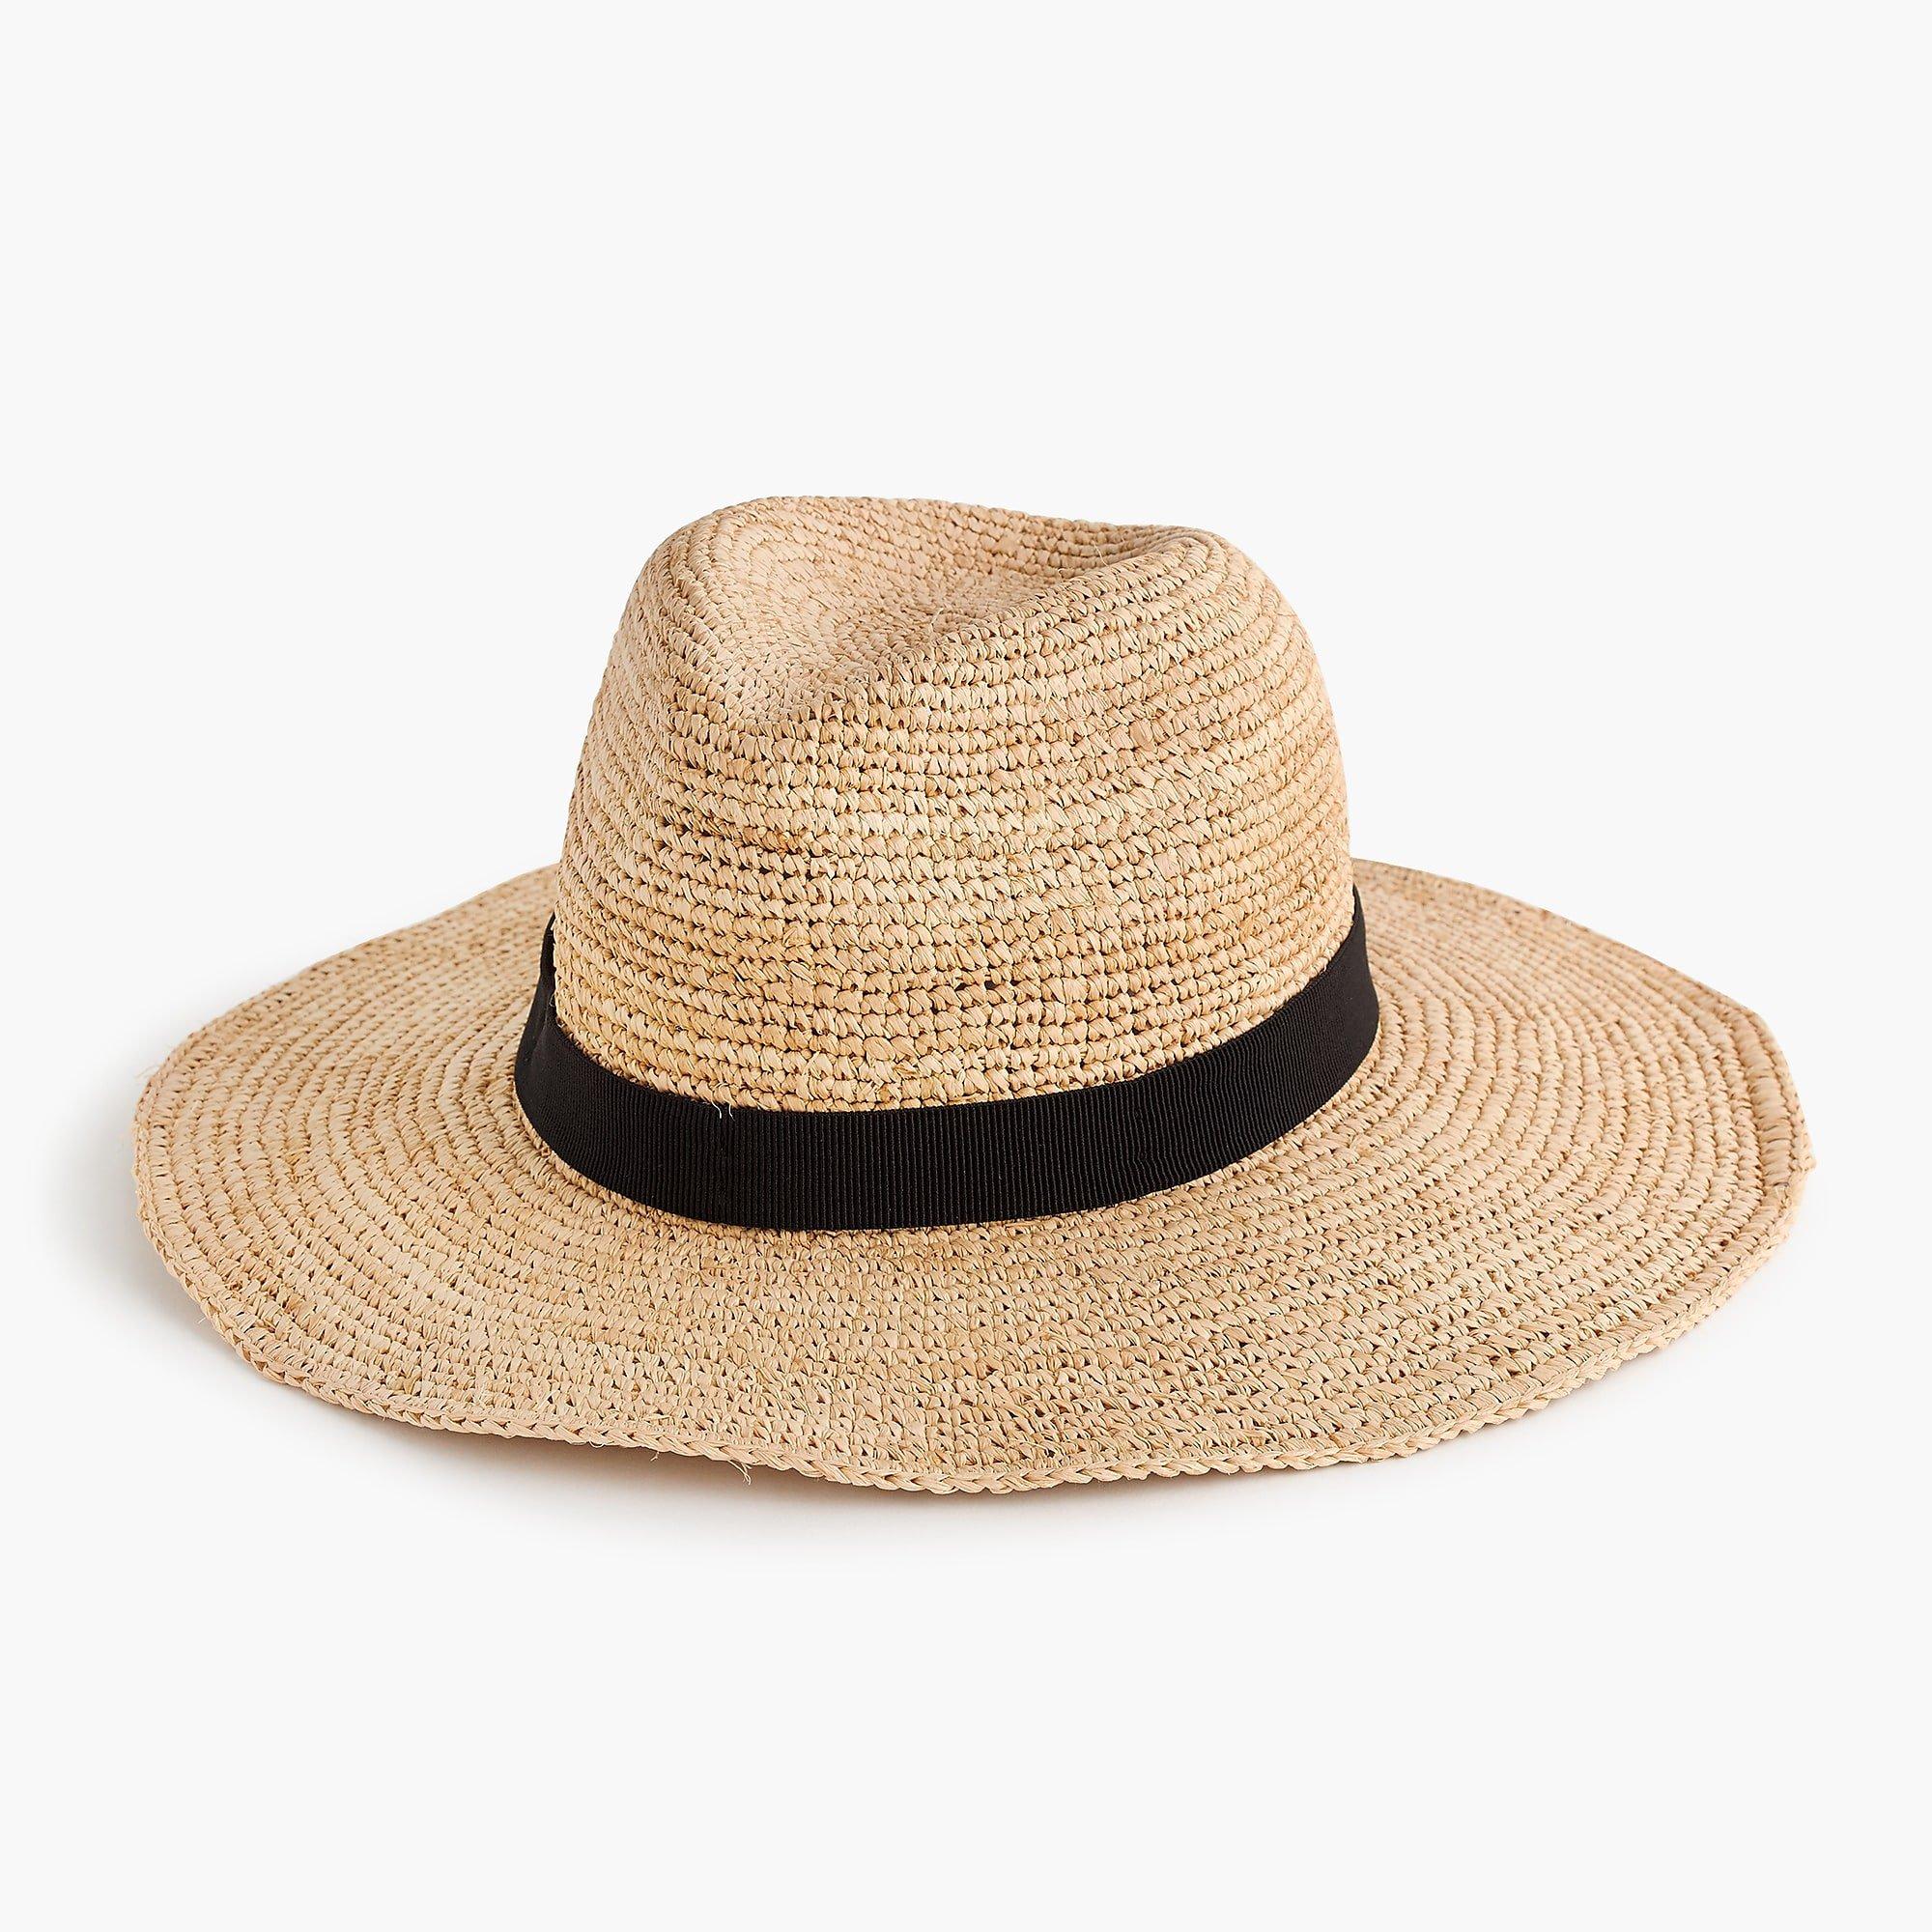 J.Crew: Wide-brim Packable Straw Hat